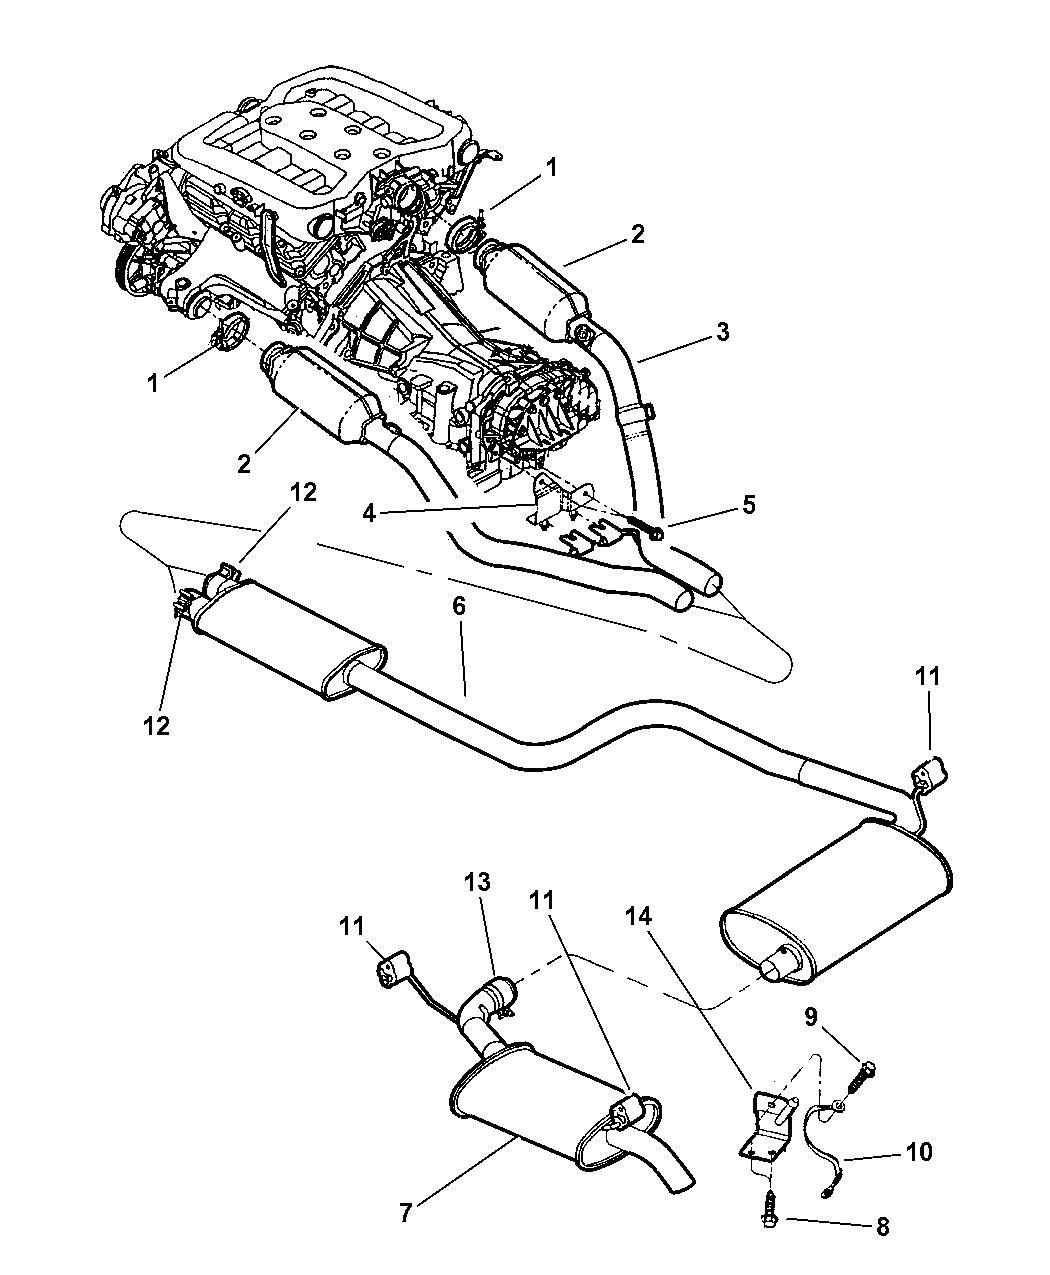 2000 Chrysler 300m Exhaust System Mopar Parts Giant Timing Belt